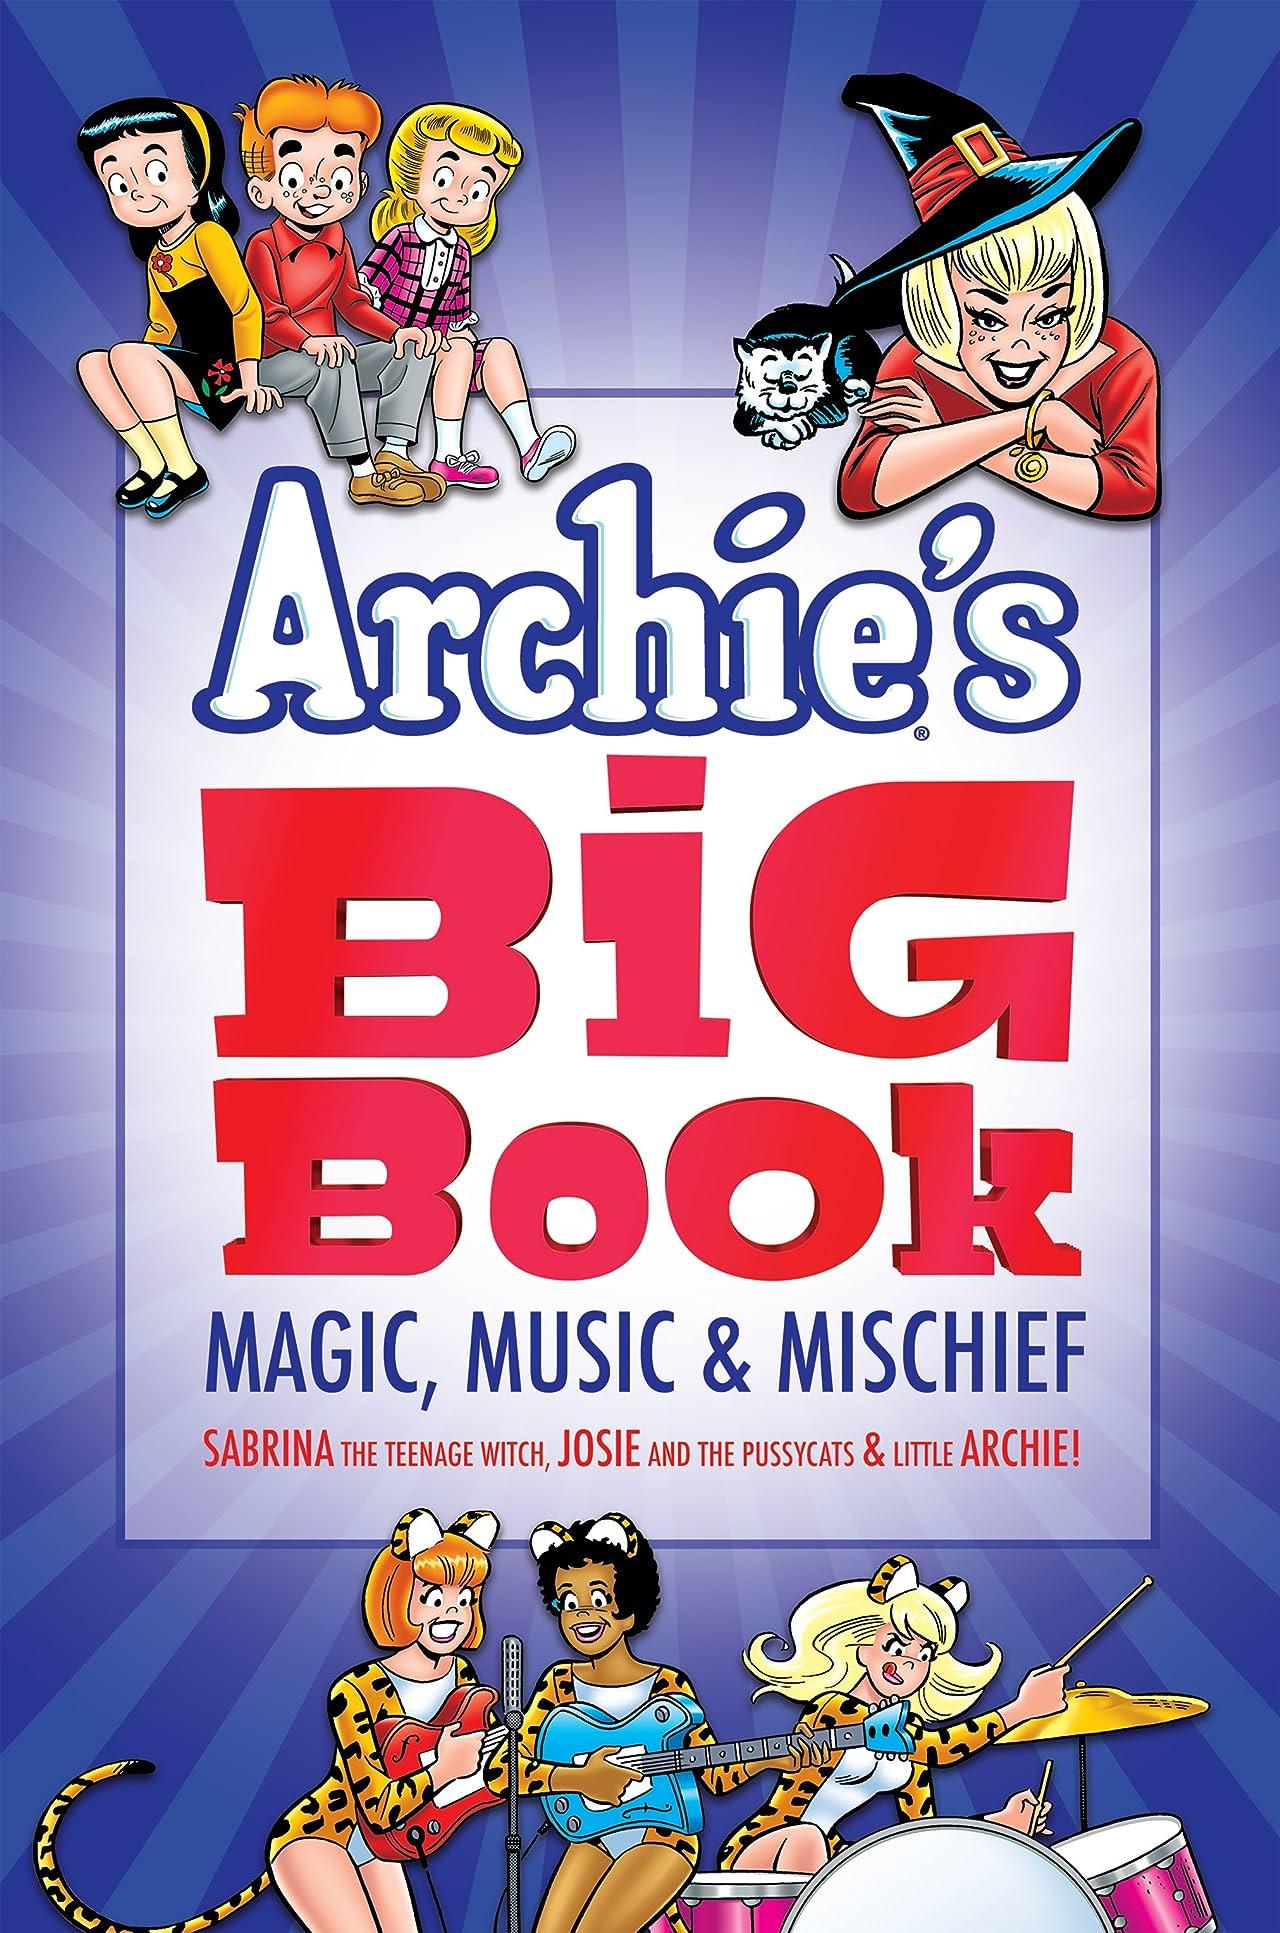 Archie's Big Book Tome 1: Magic, Music & Mischief